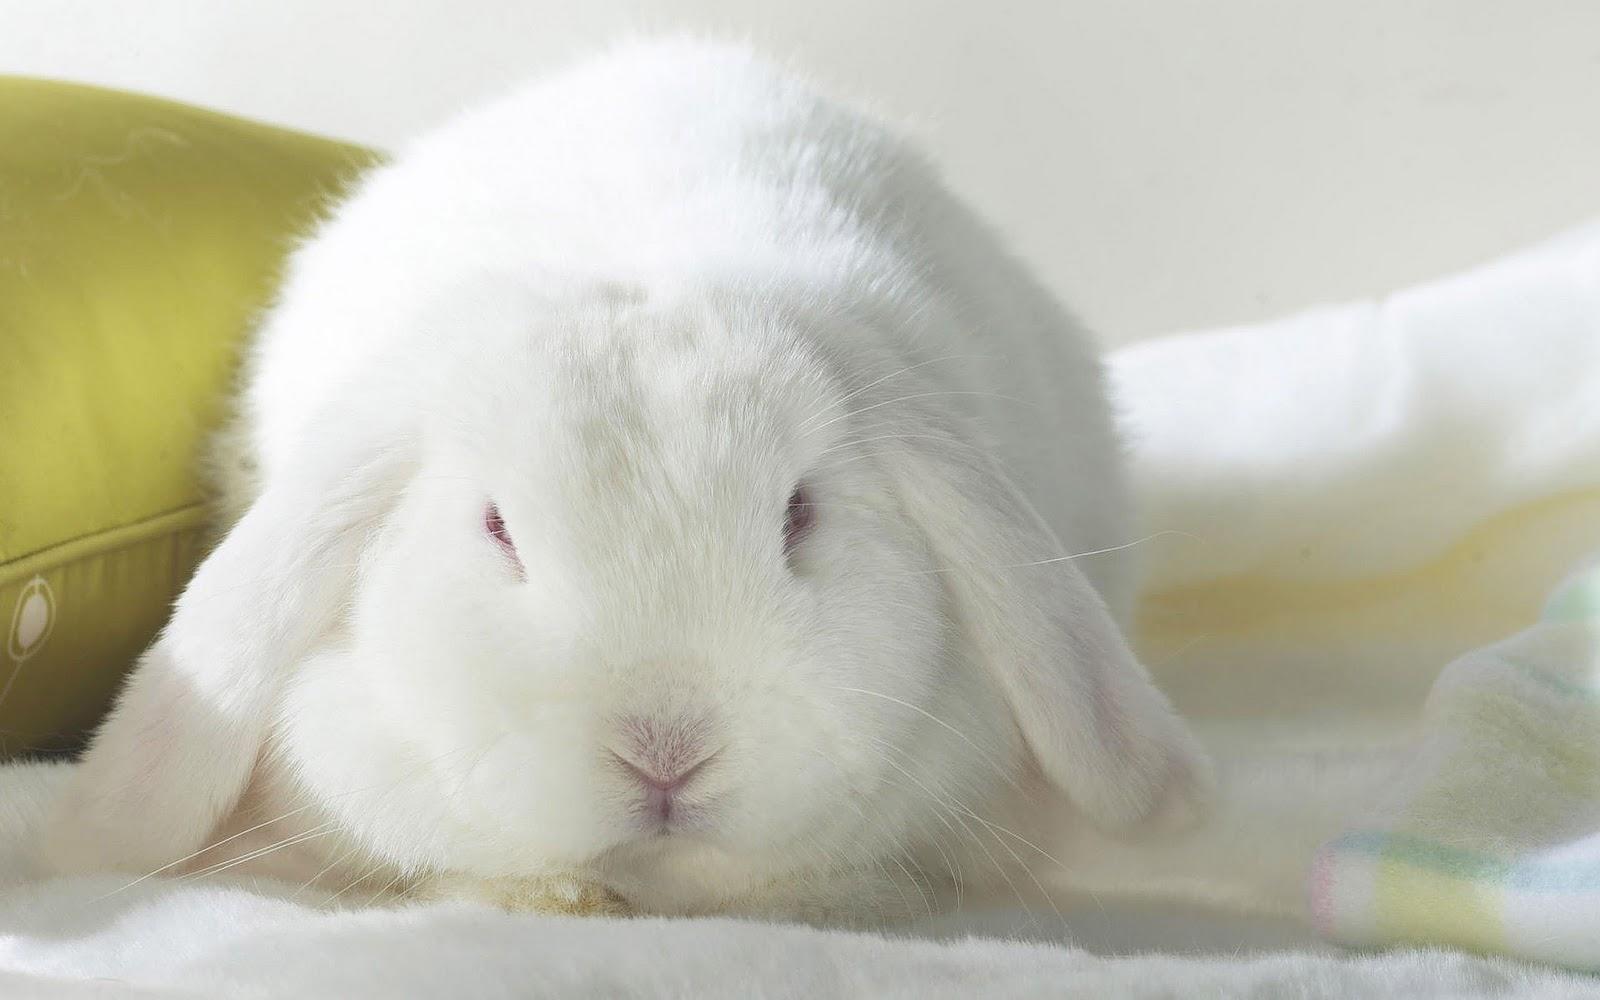 cute rabbit wallpaper - photo #14